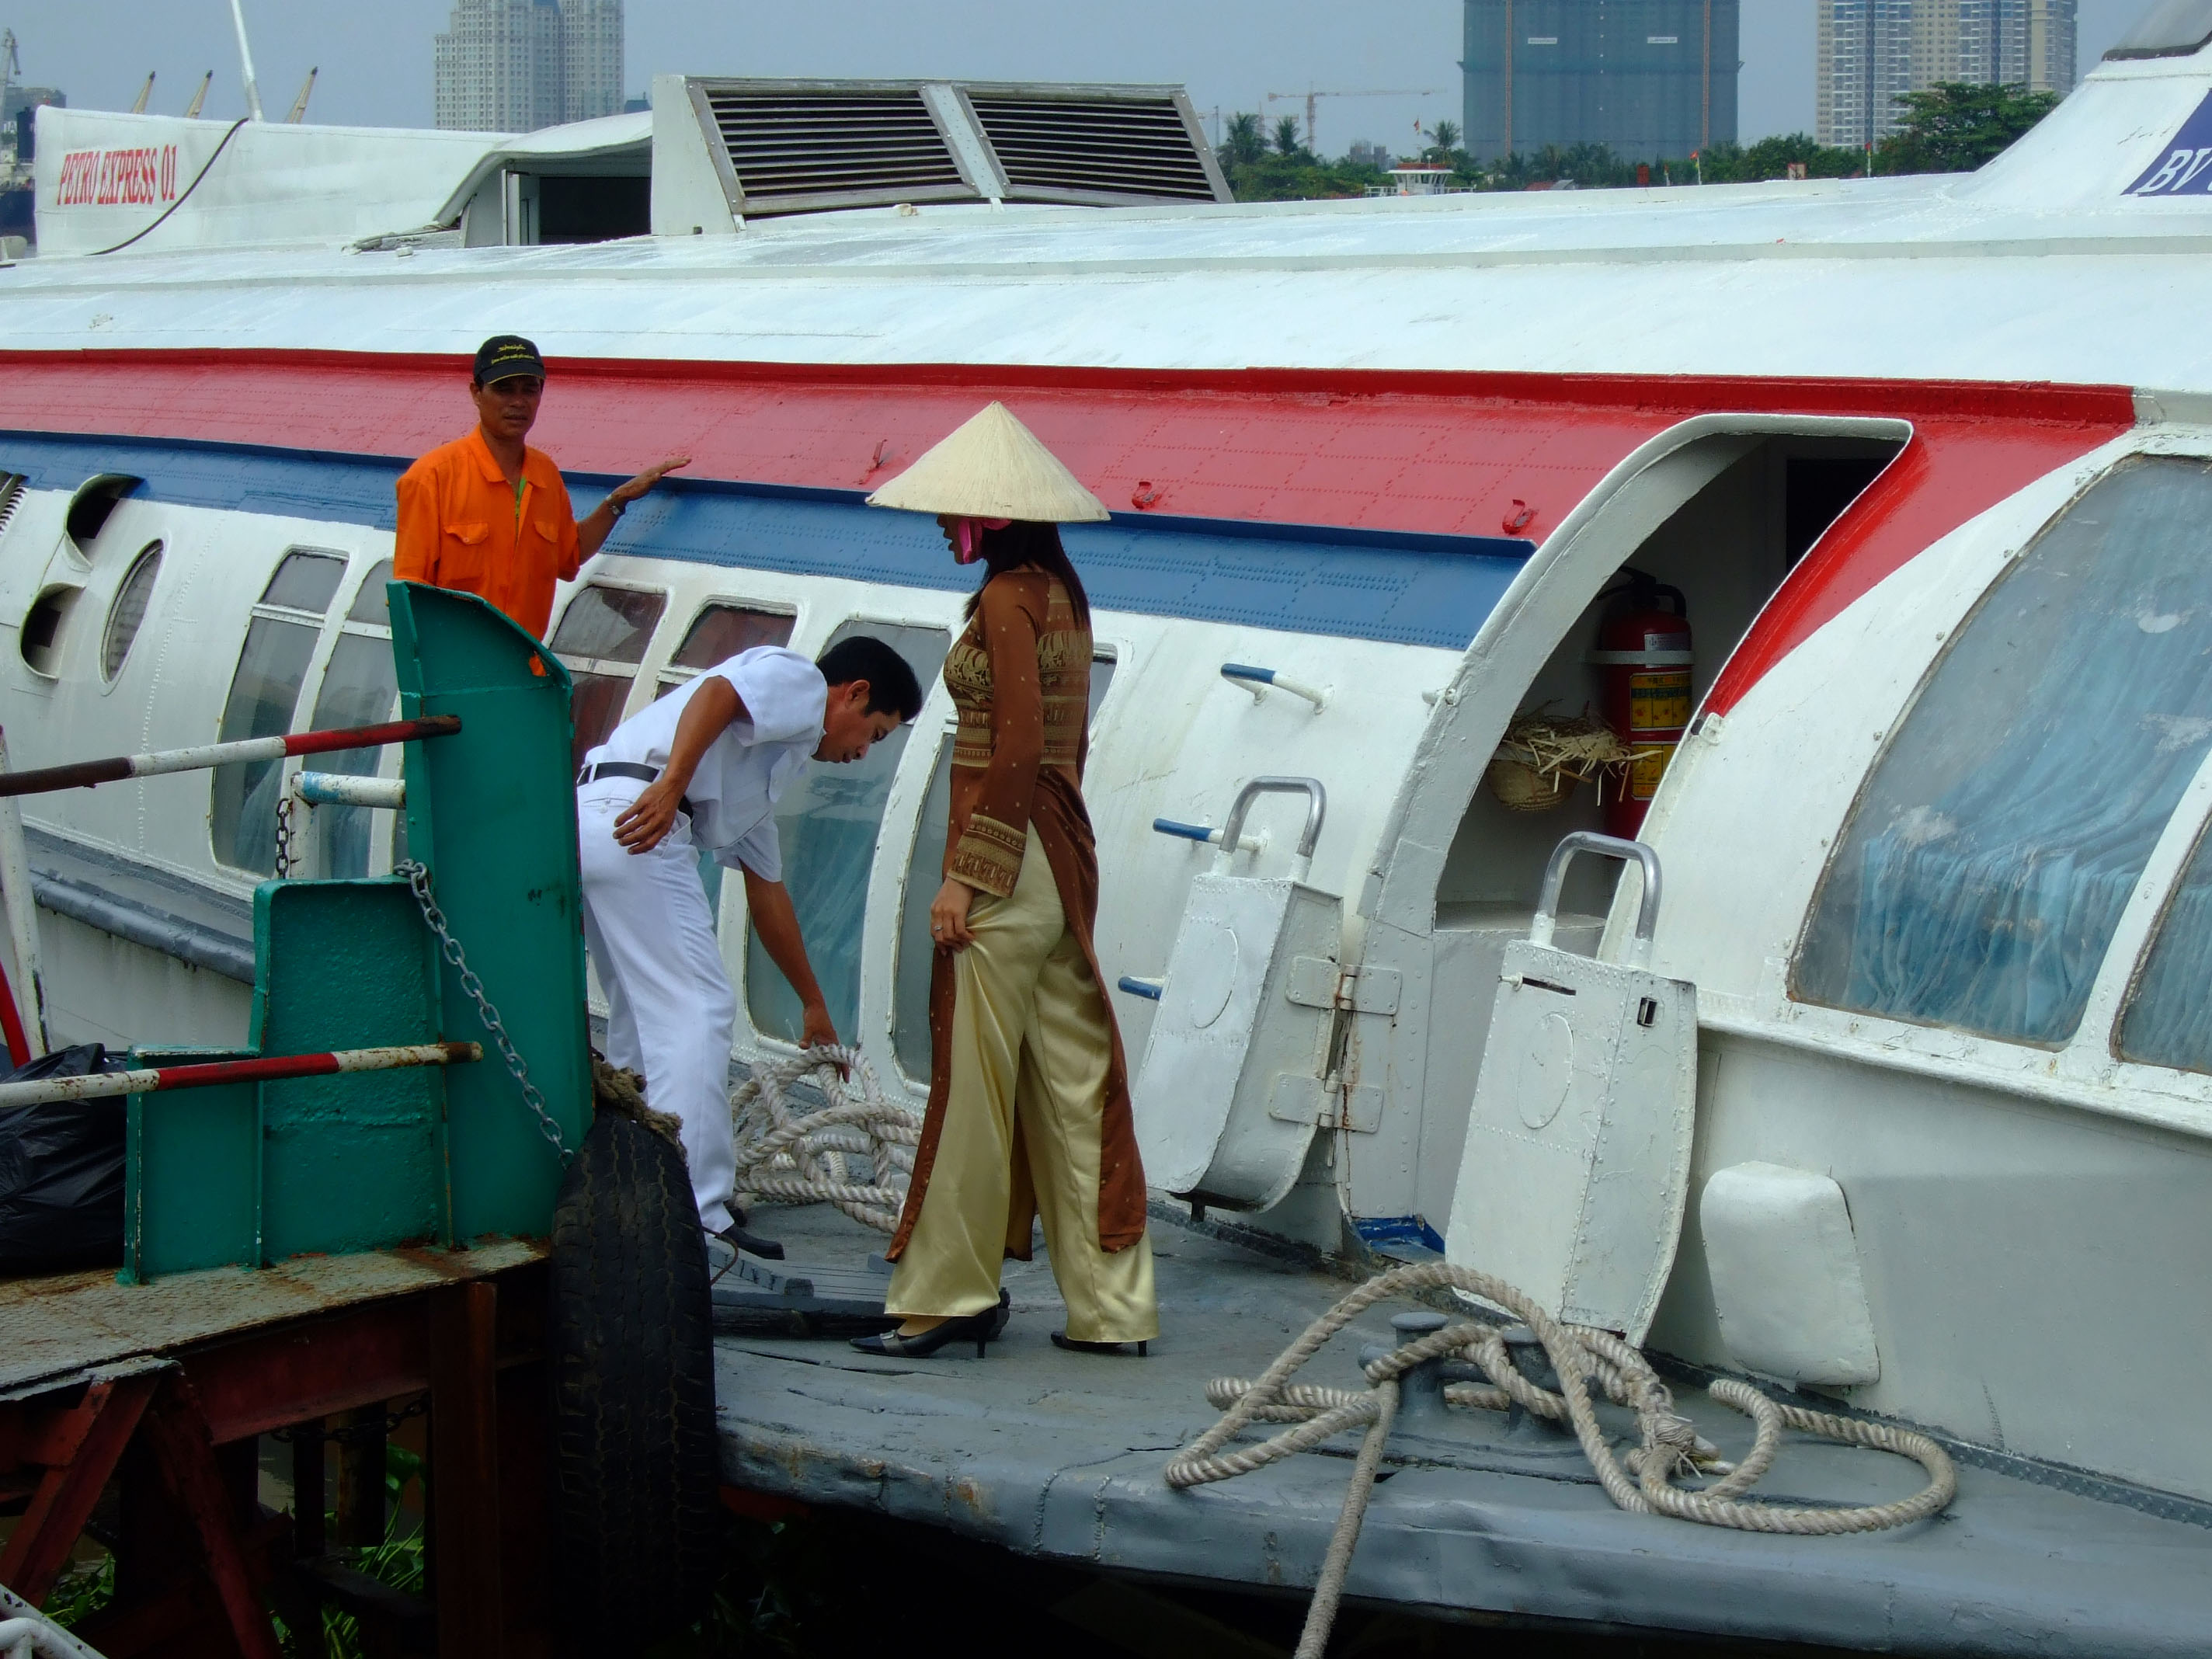 Vietnam Ho Chi Minh City Saigon harbor Ferries boats Feb 2009 36